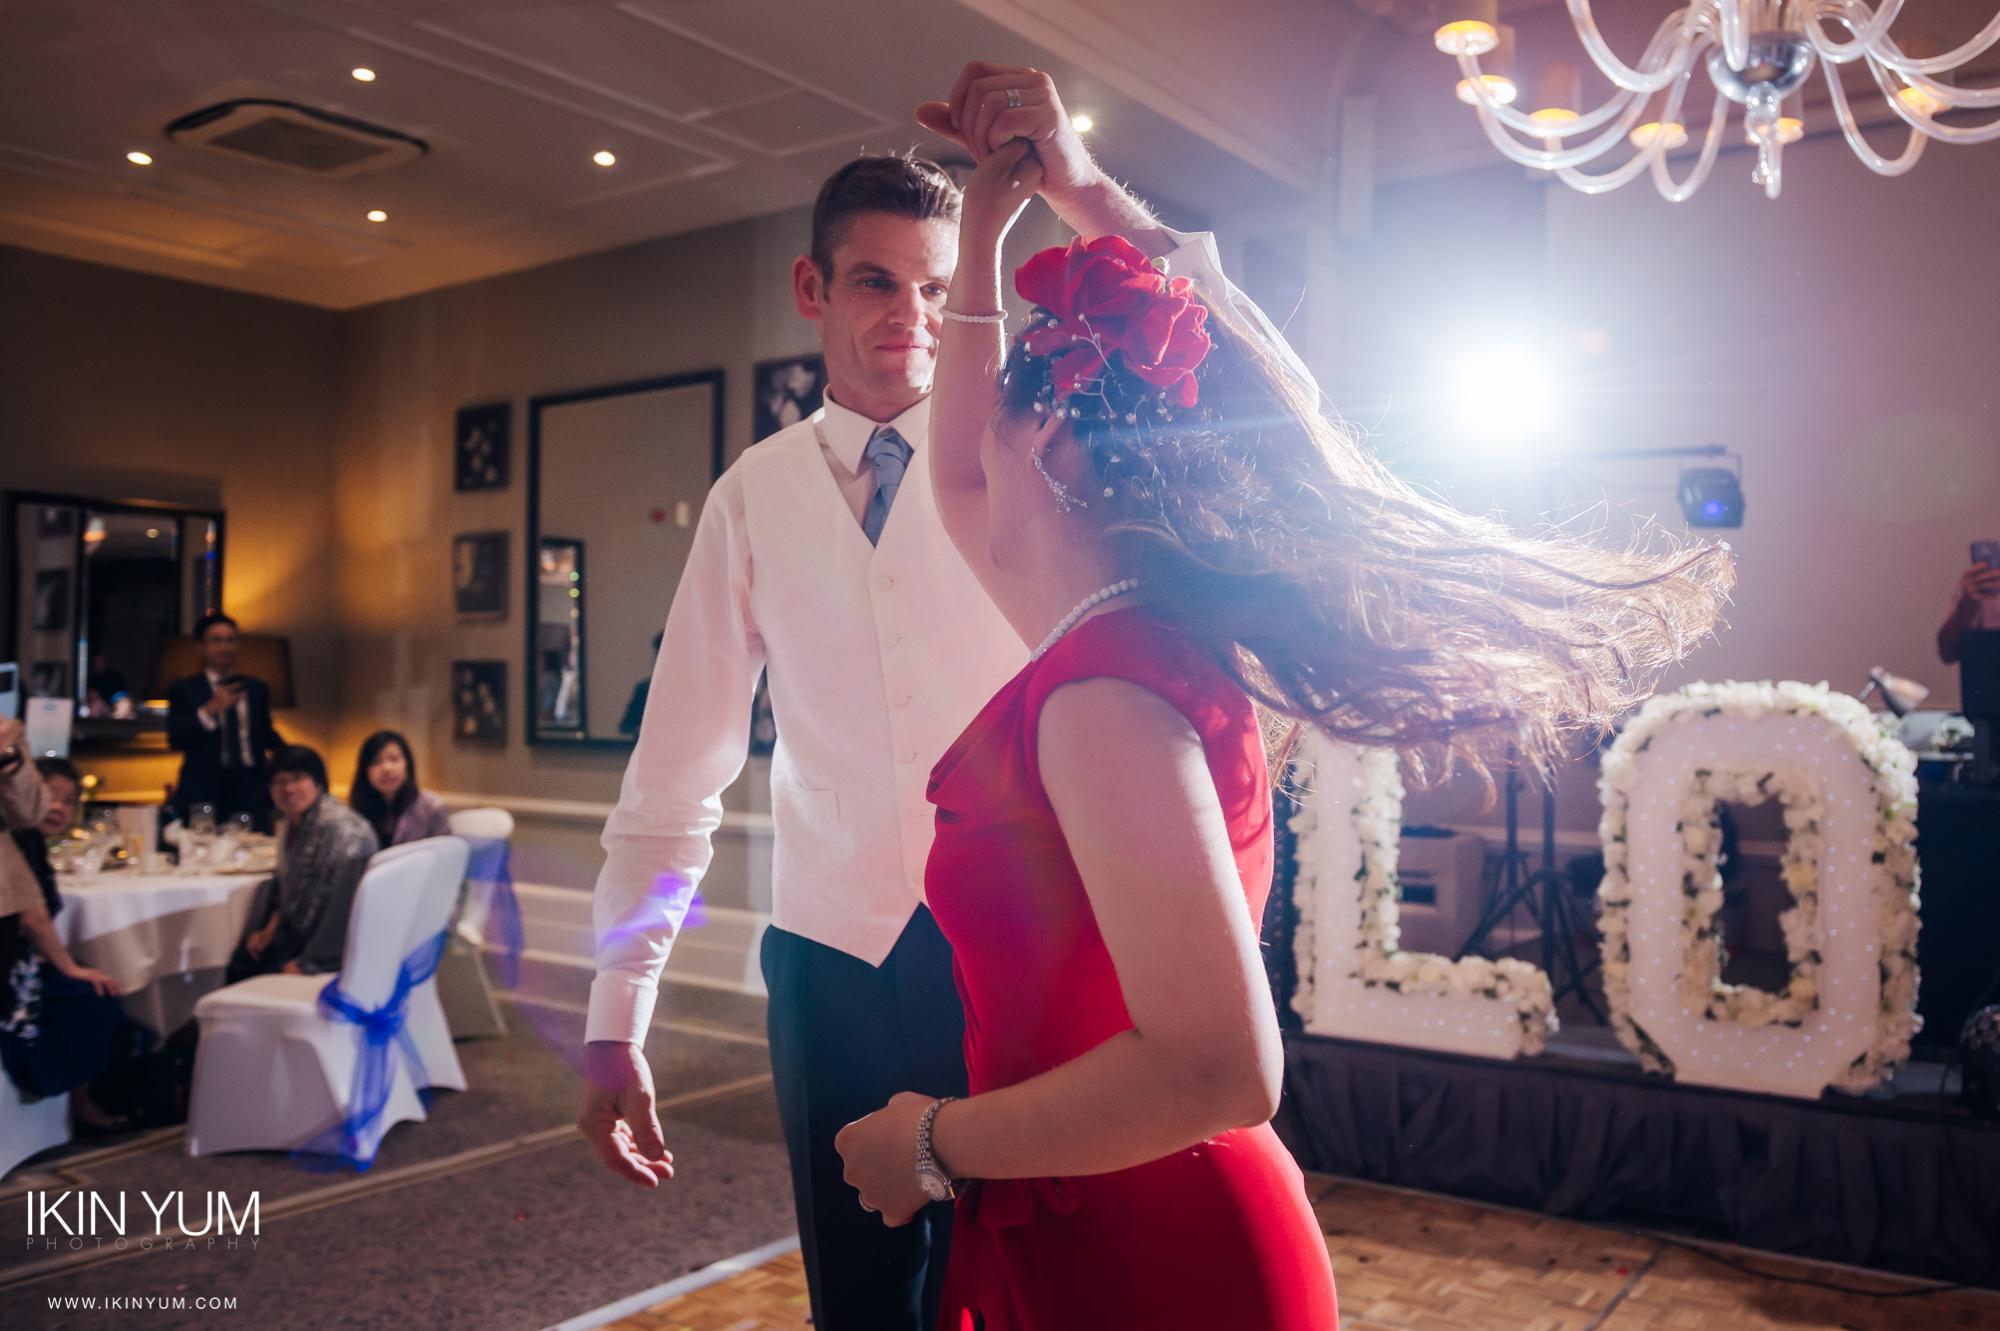 Teresa & Johnathan Weddong Day - First Dance & Party-0010.jpg